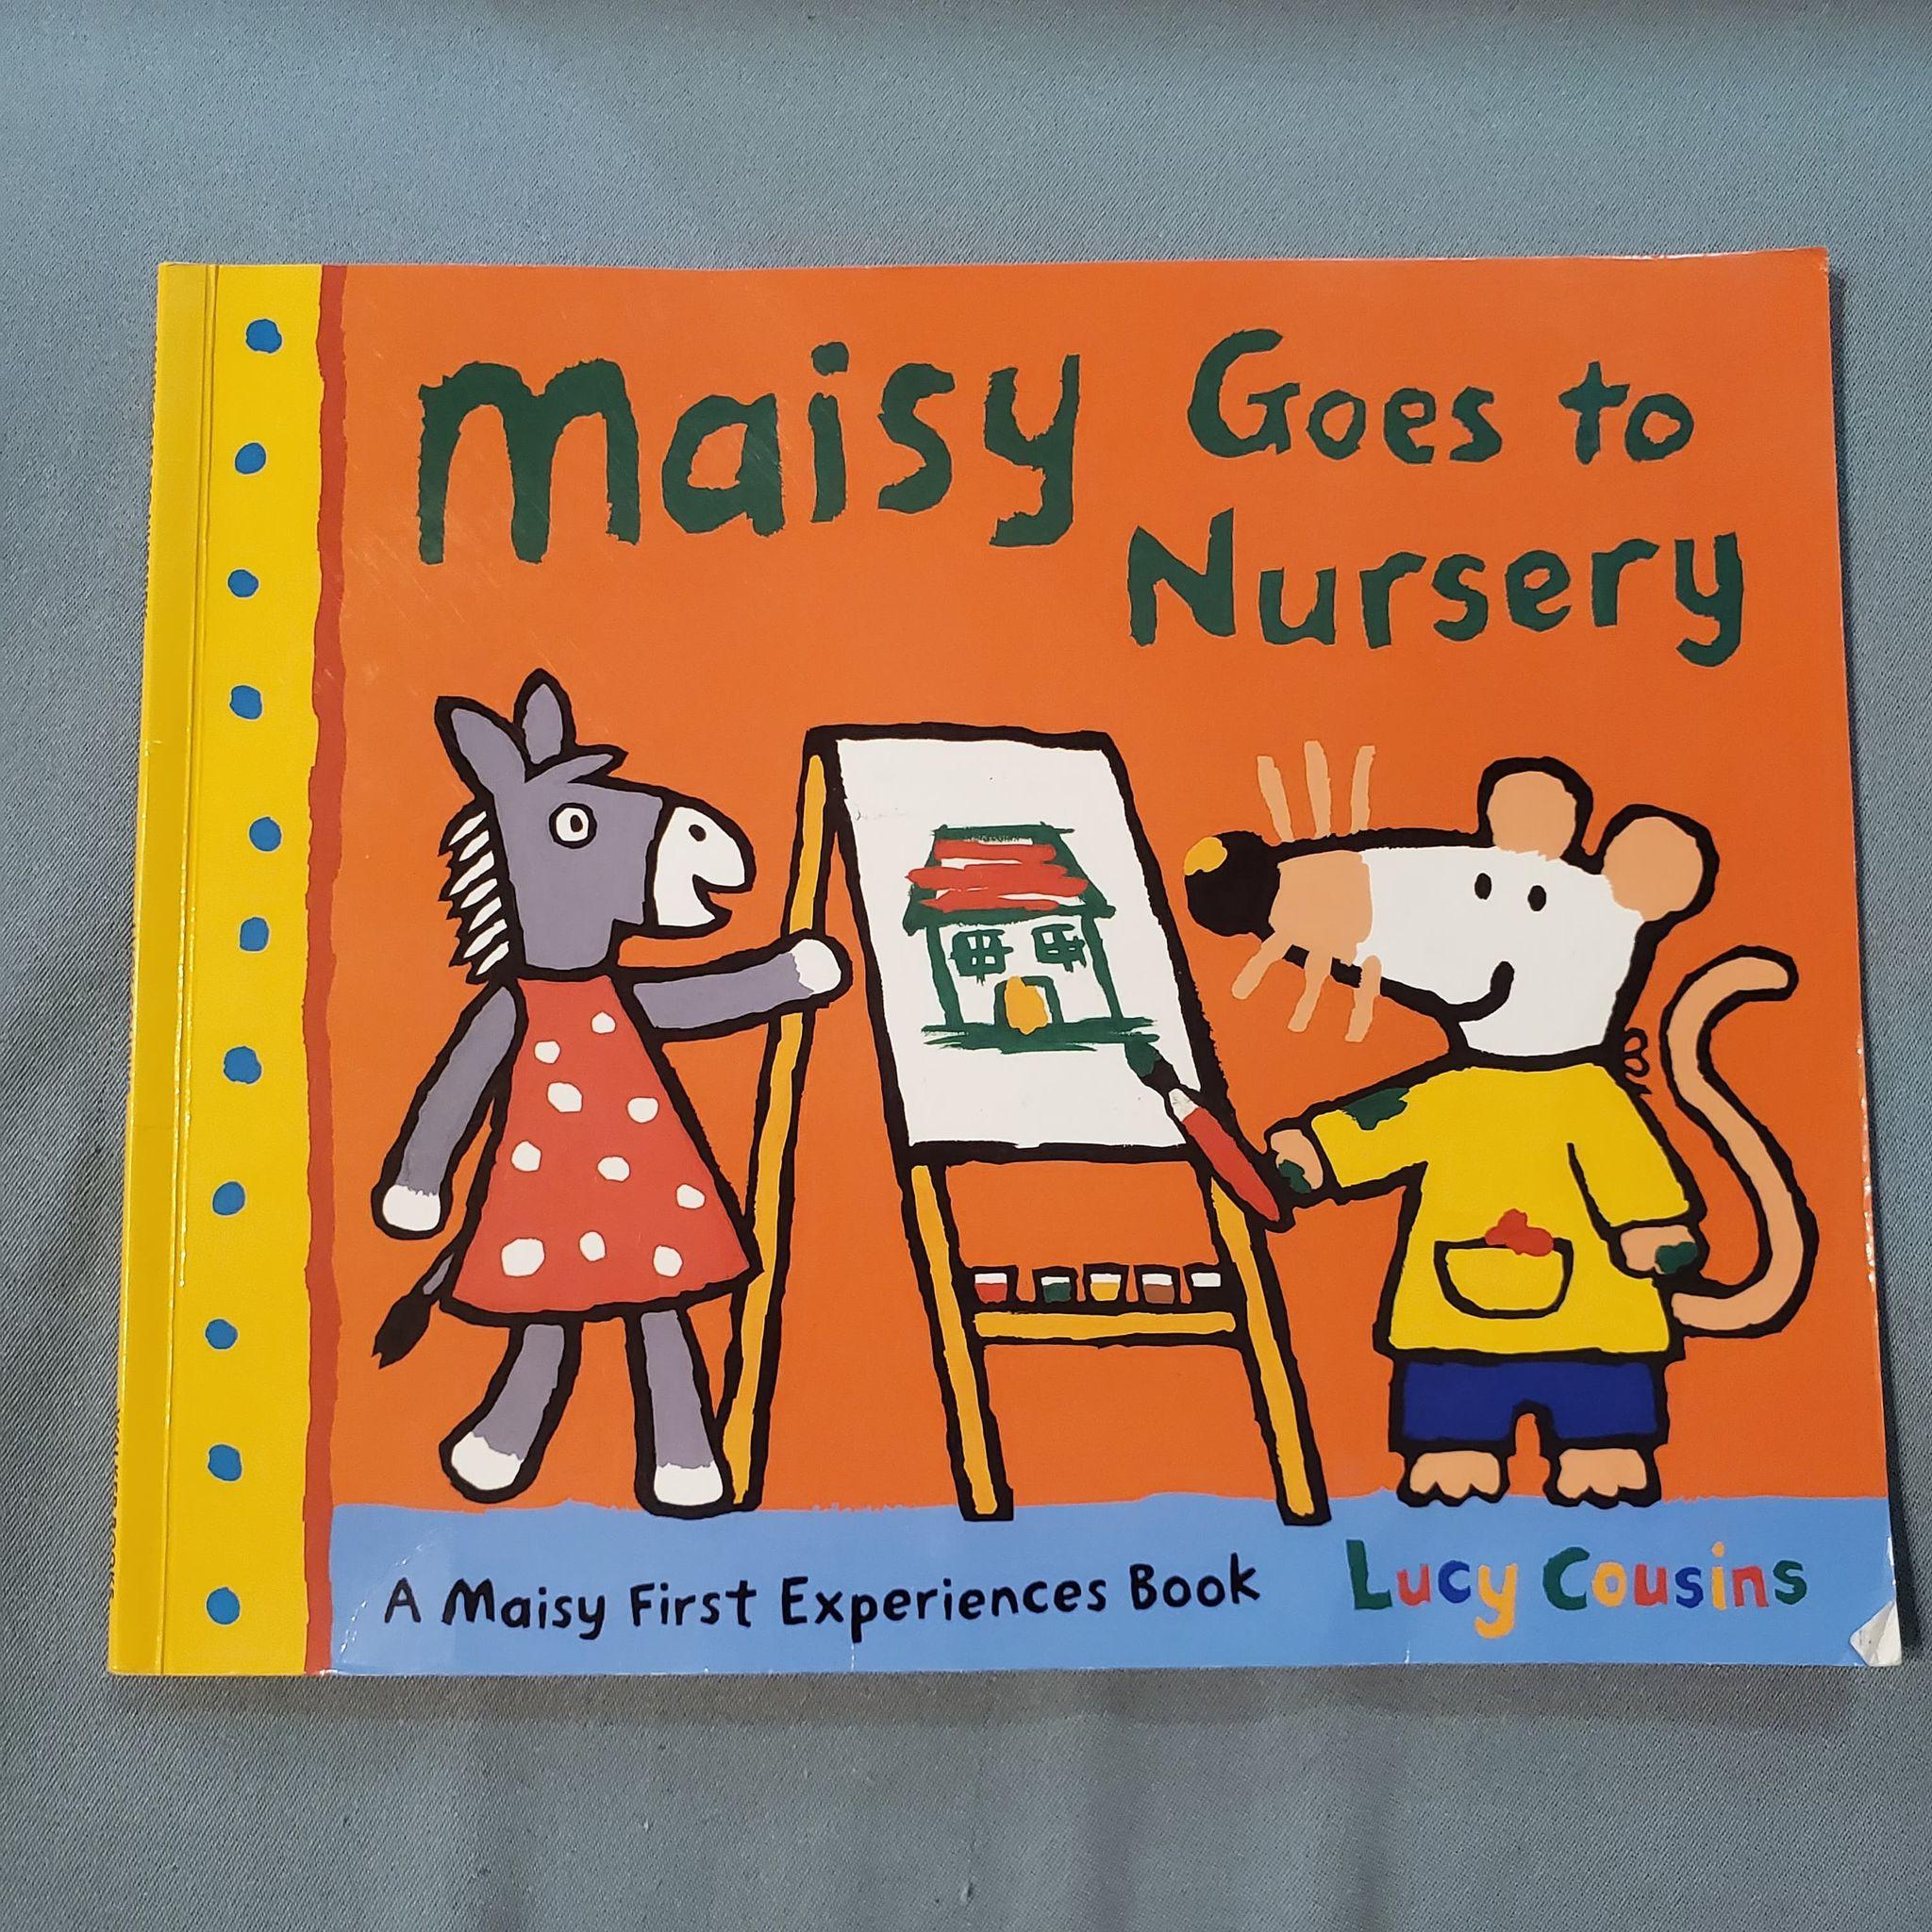 說書人EP3/Maisy Goes to Nursery